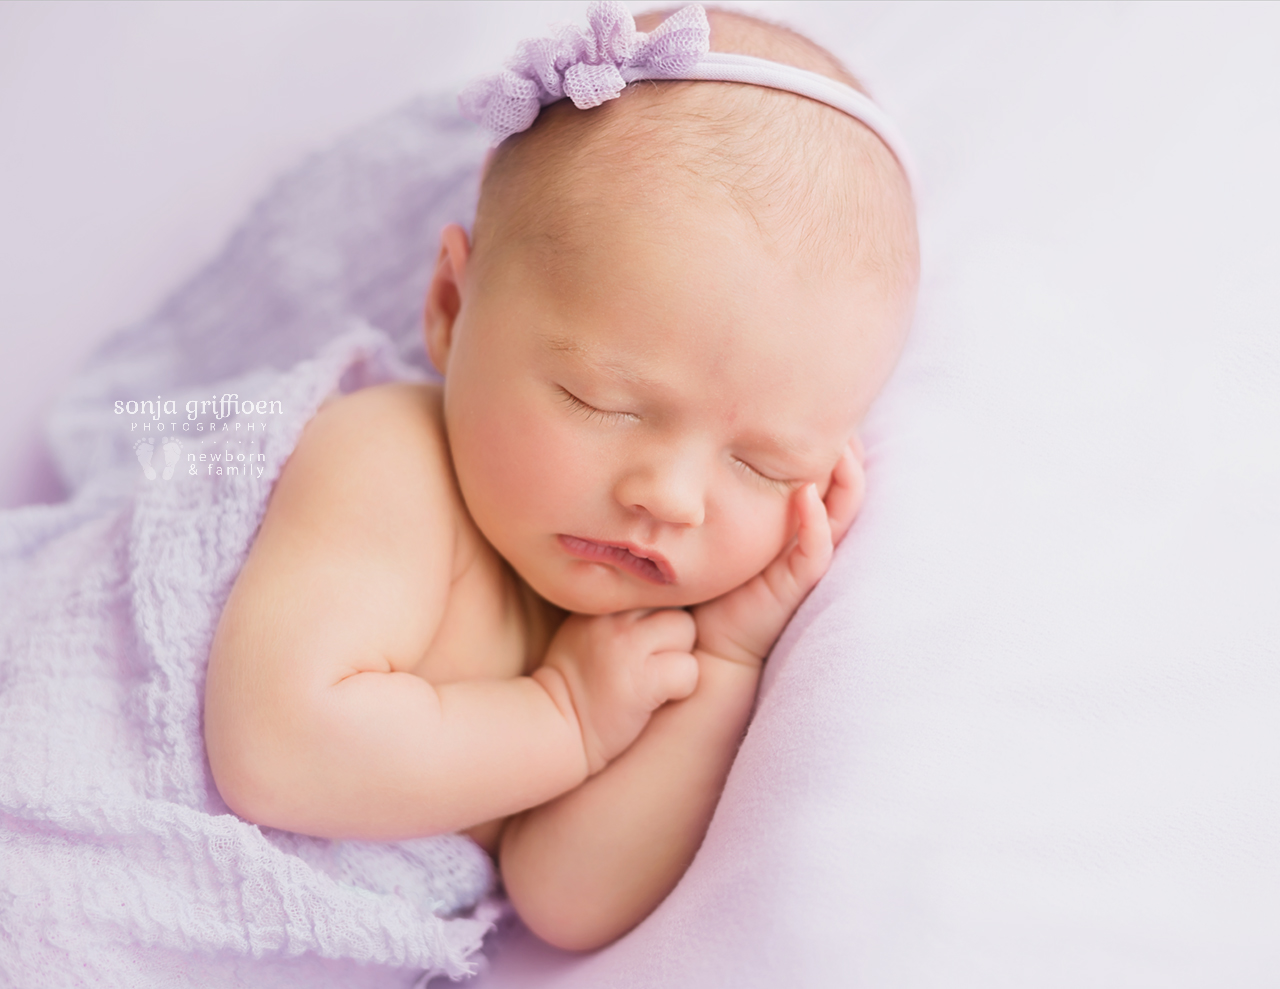 Macey-Newborn-Brisbane-Newborn-Photographer-Sonja-Griffioen-09.jpg